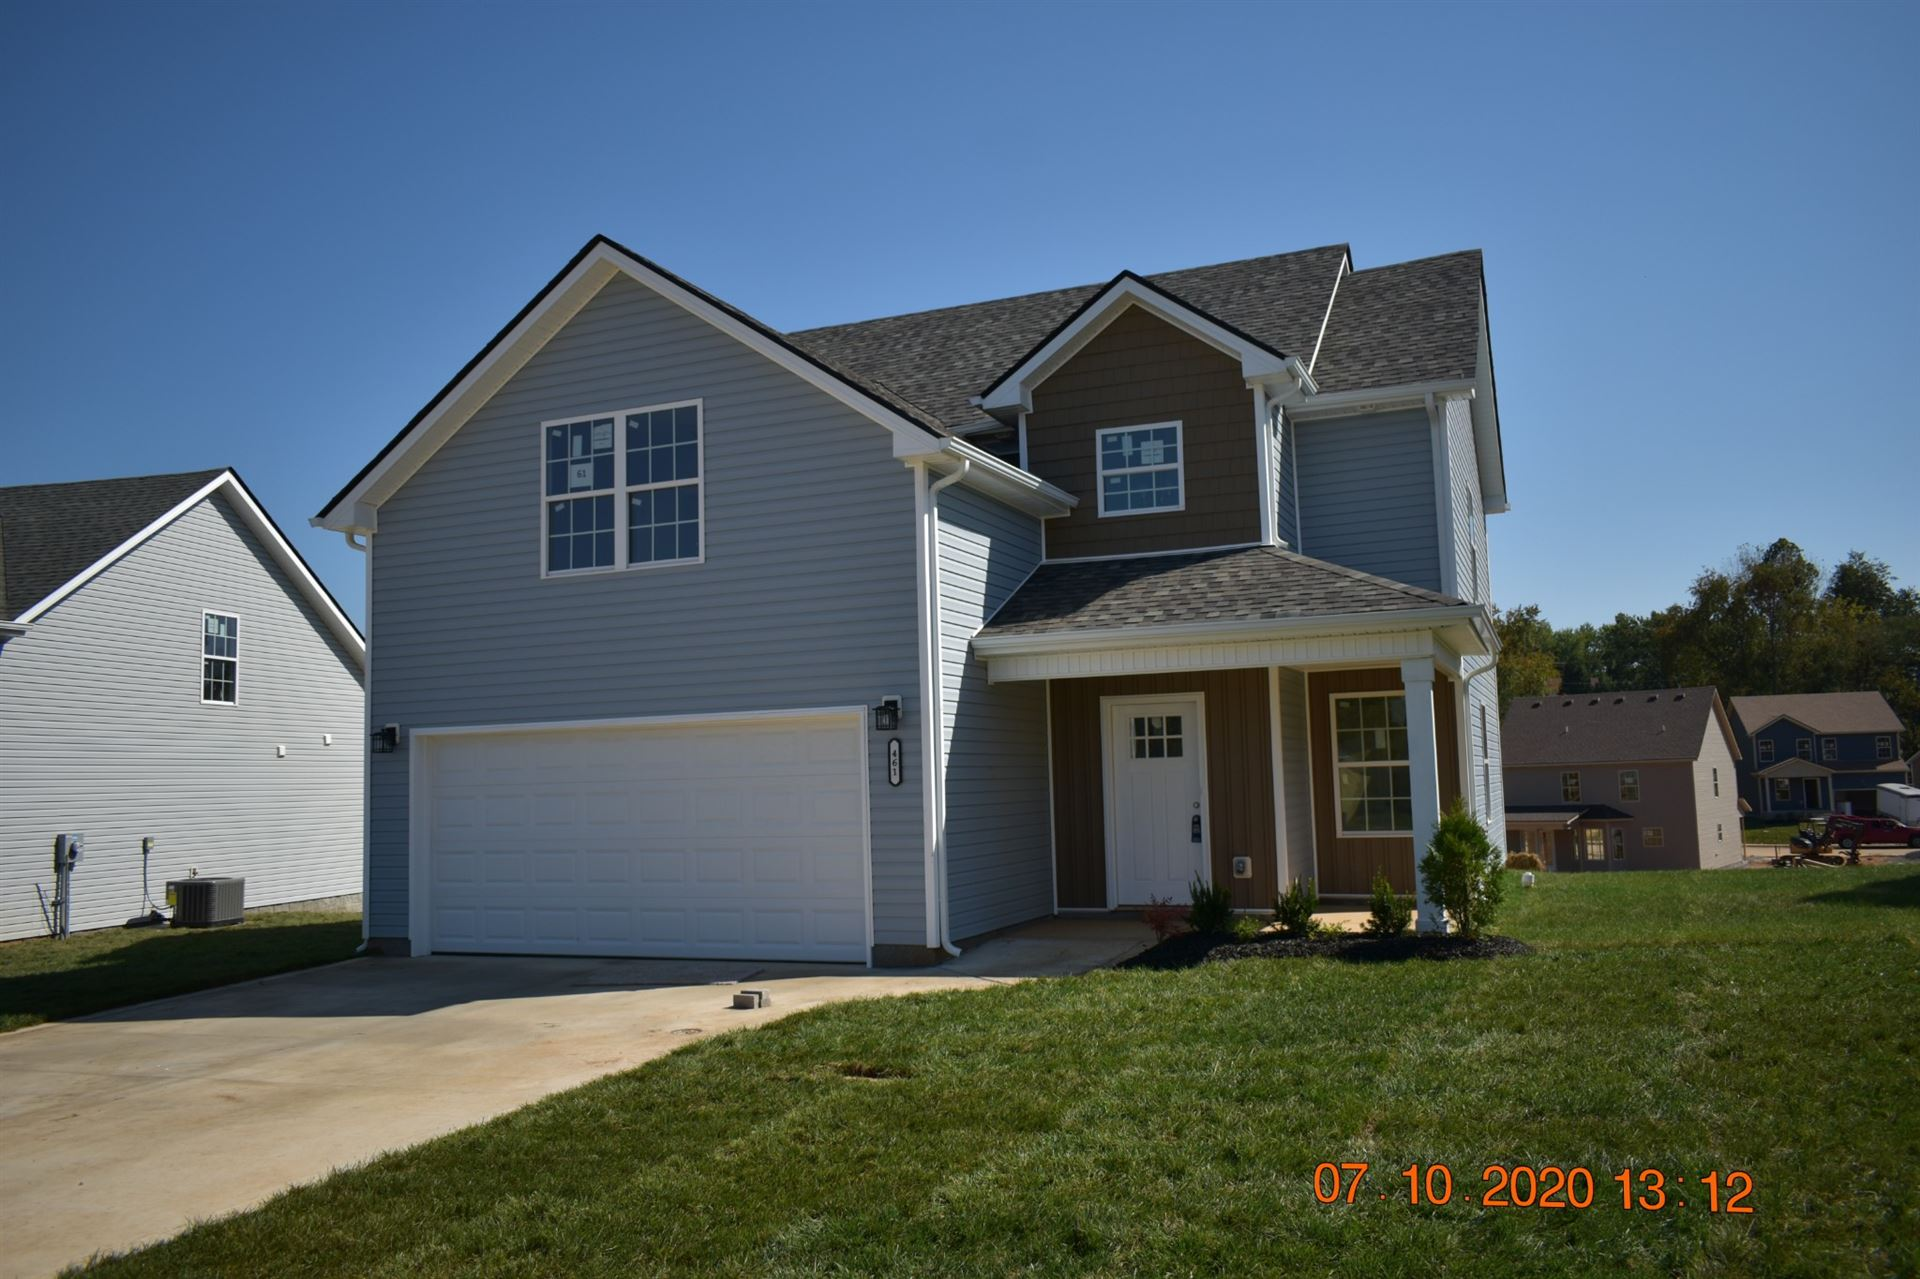 61 Chestnut Hill, Clarksville, TN 37042 - MLS#: 2129813